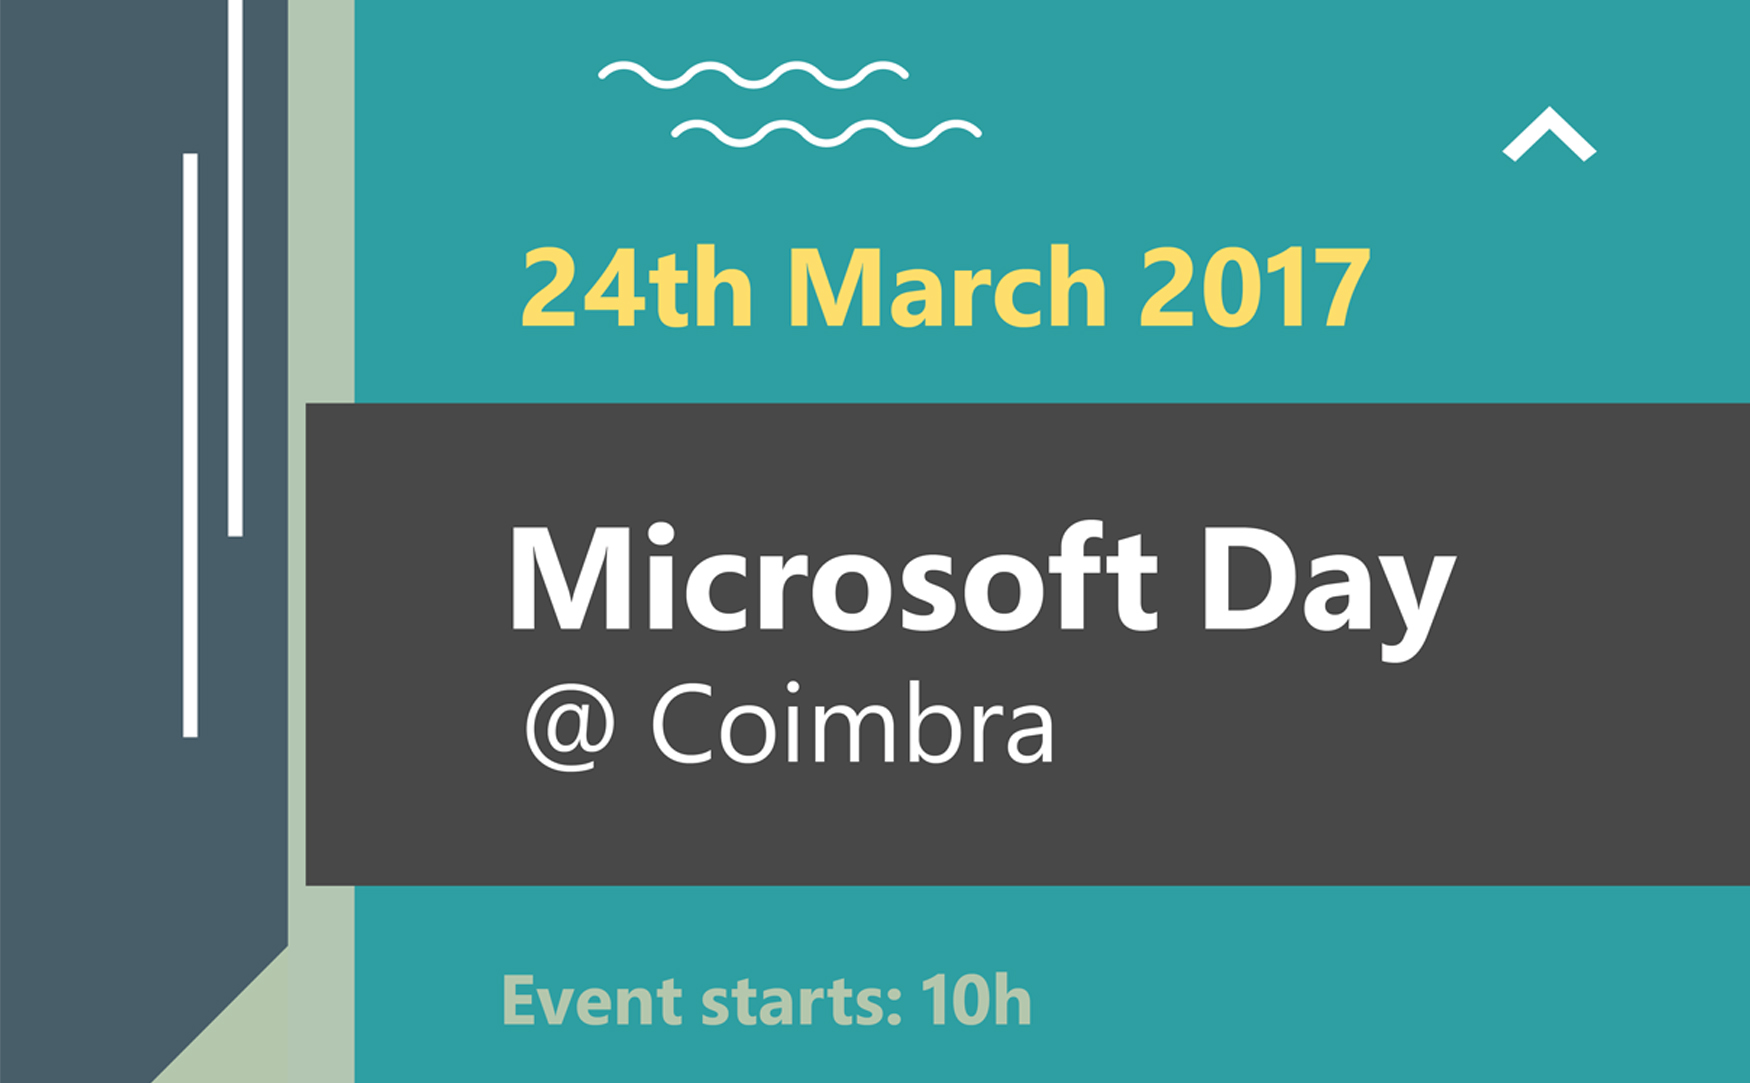 20170324_microsoftday